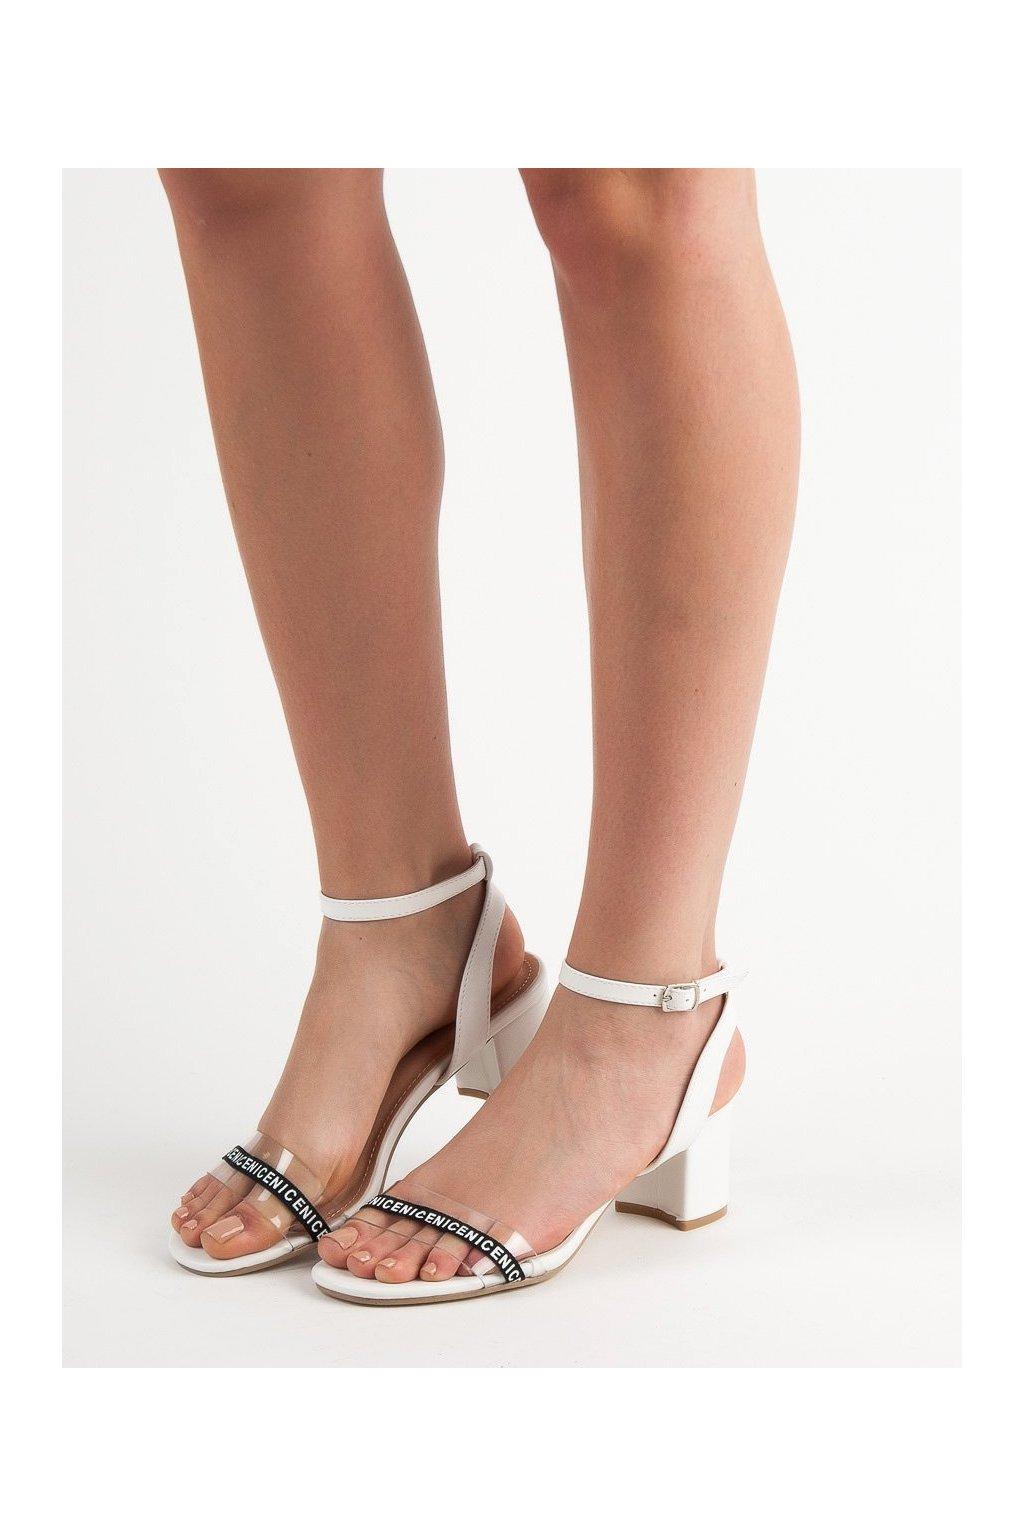 Biele sandále na hrubom podpätku Ideal shoes kod S-7347W